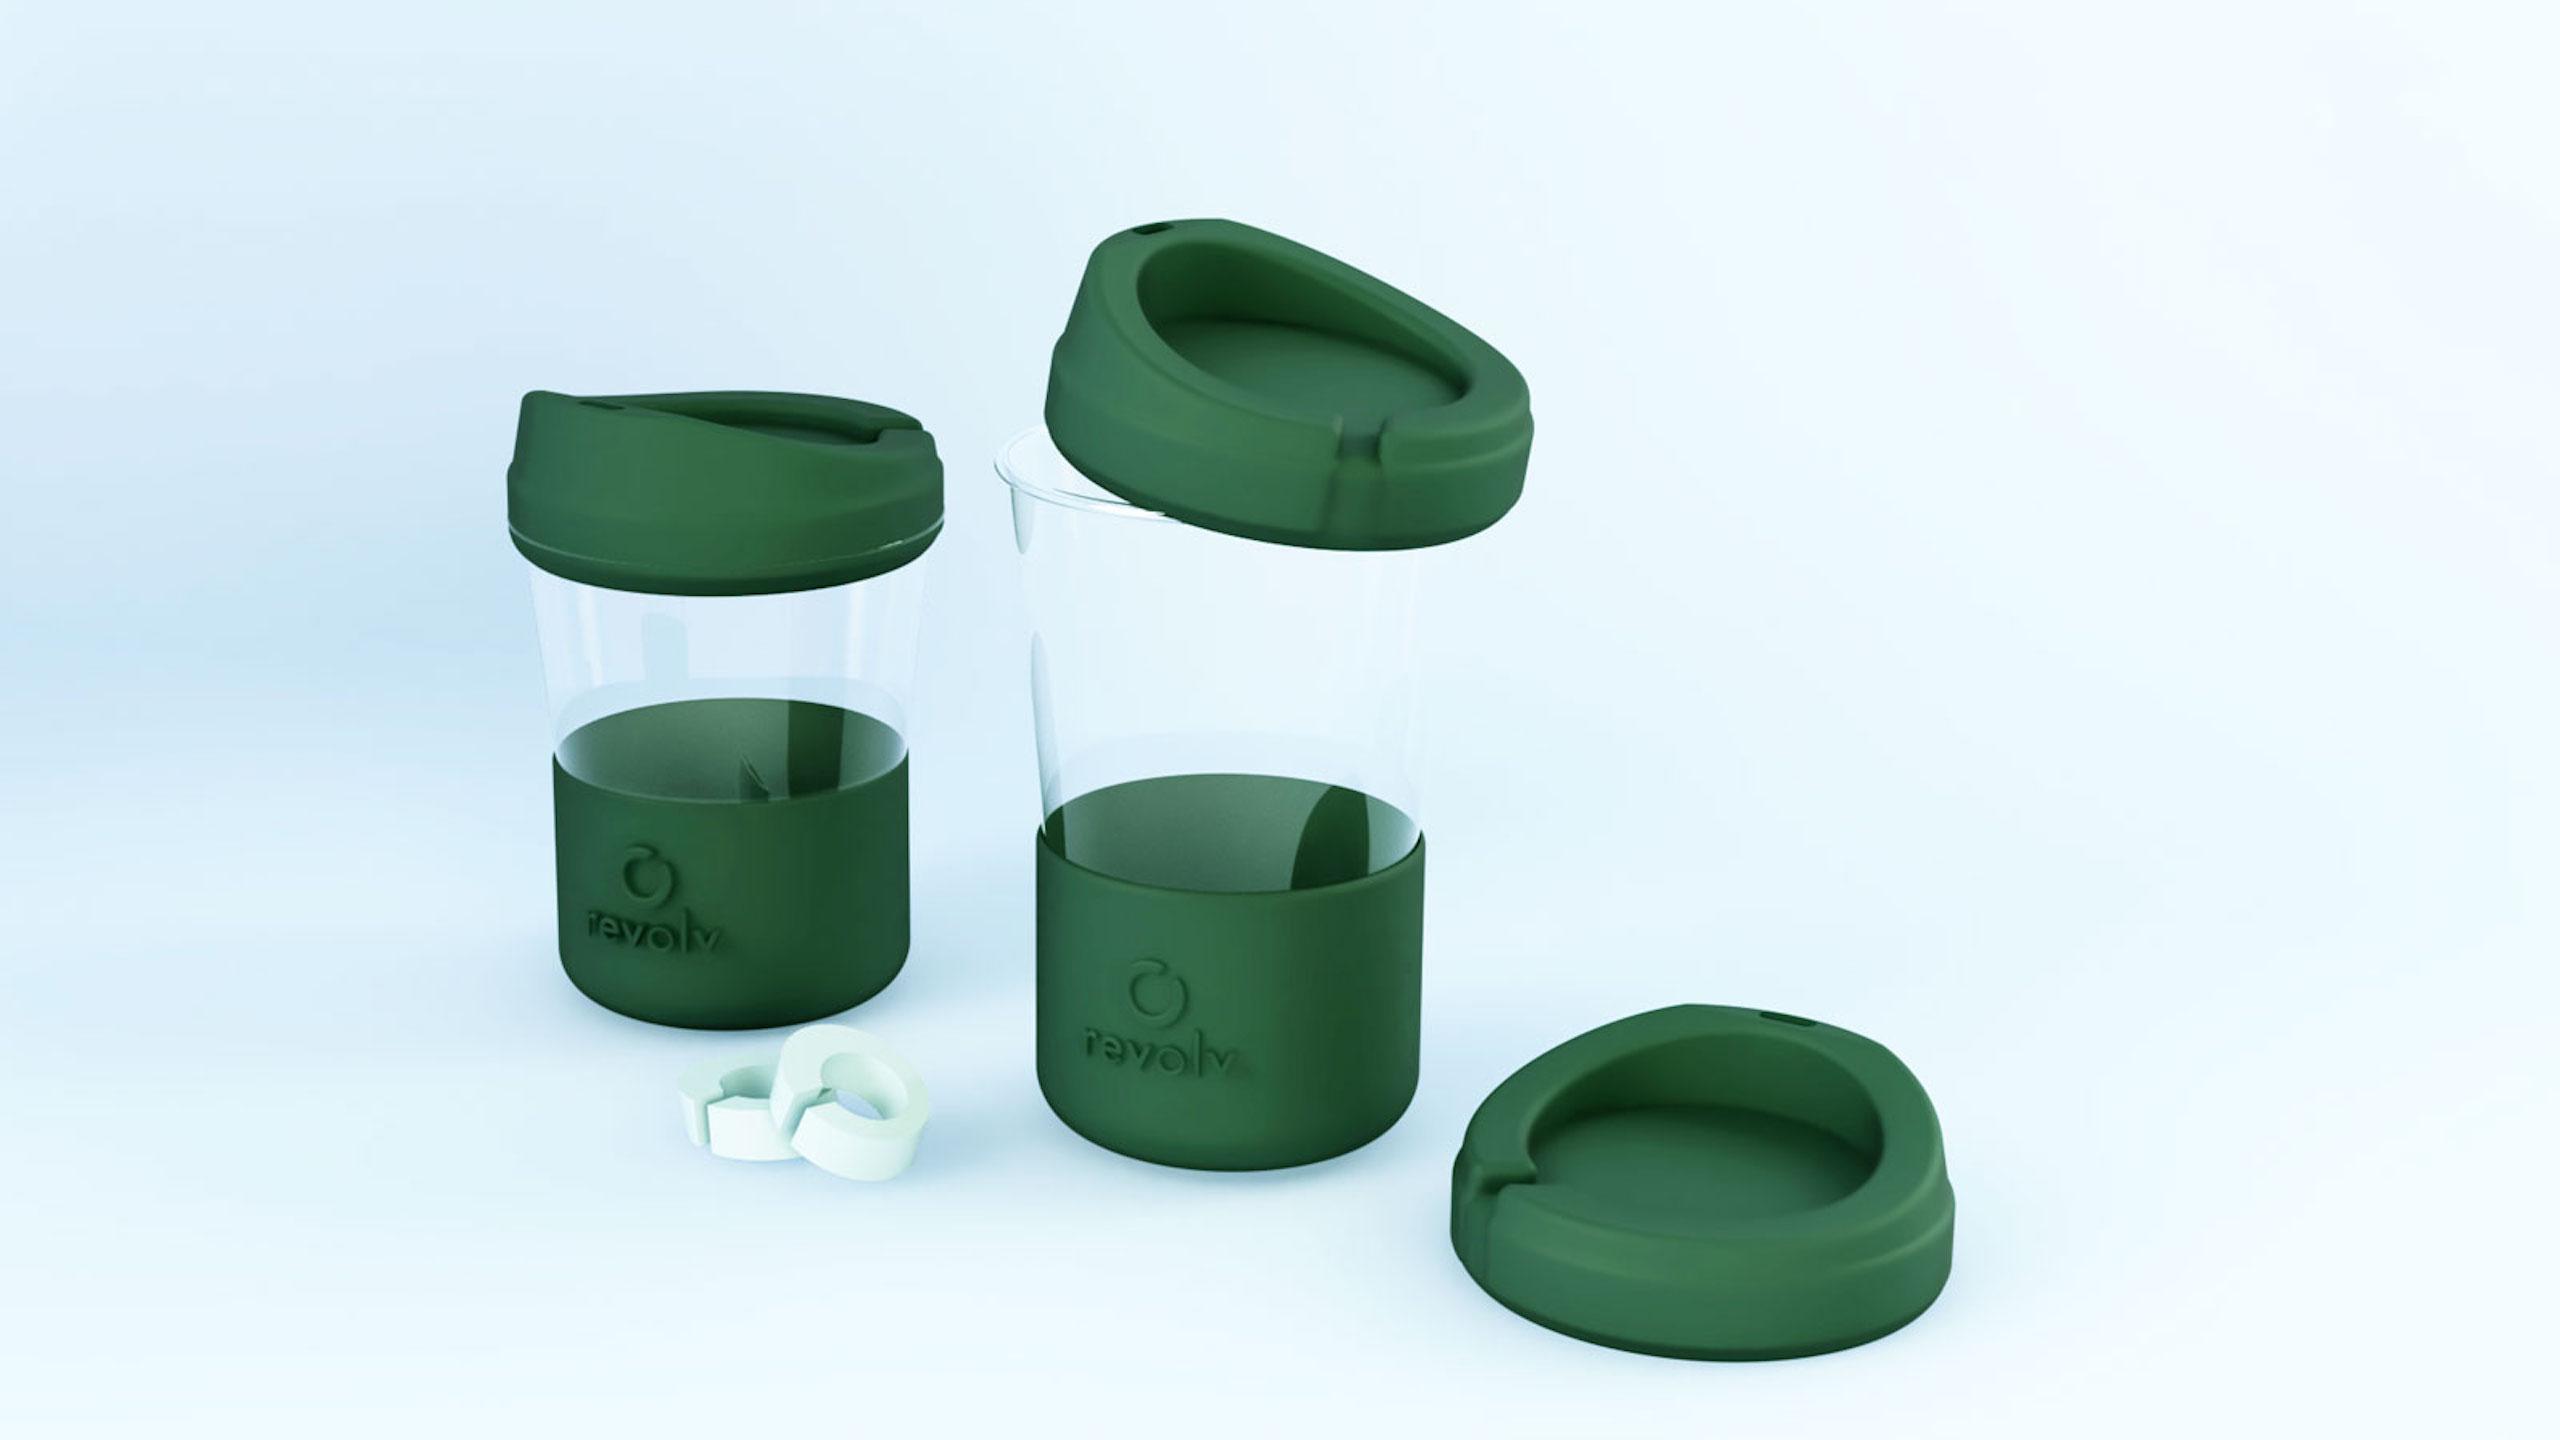 vaso sustentables starbucks